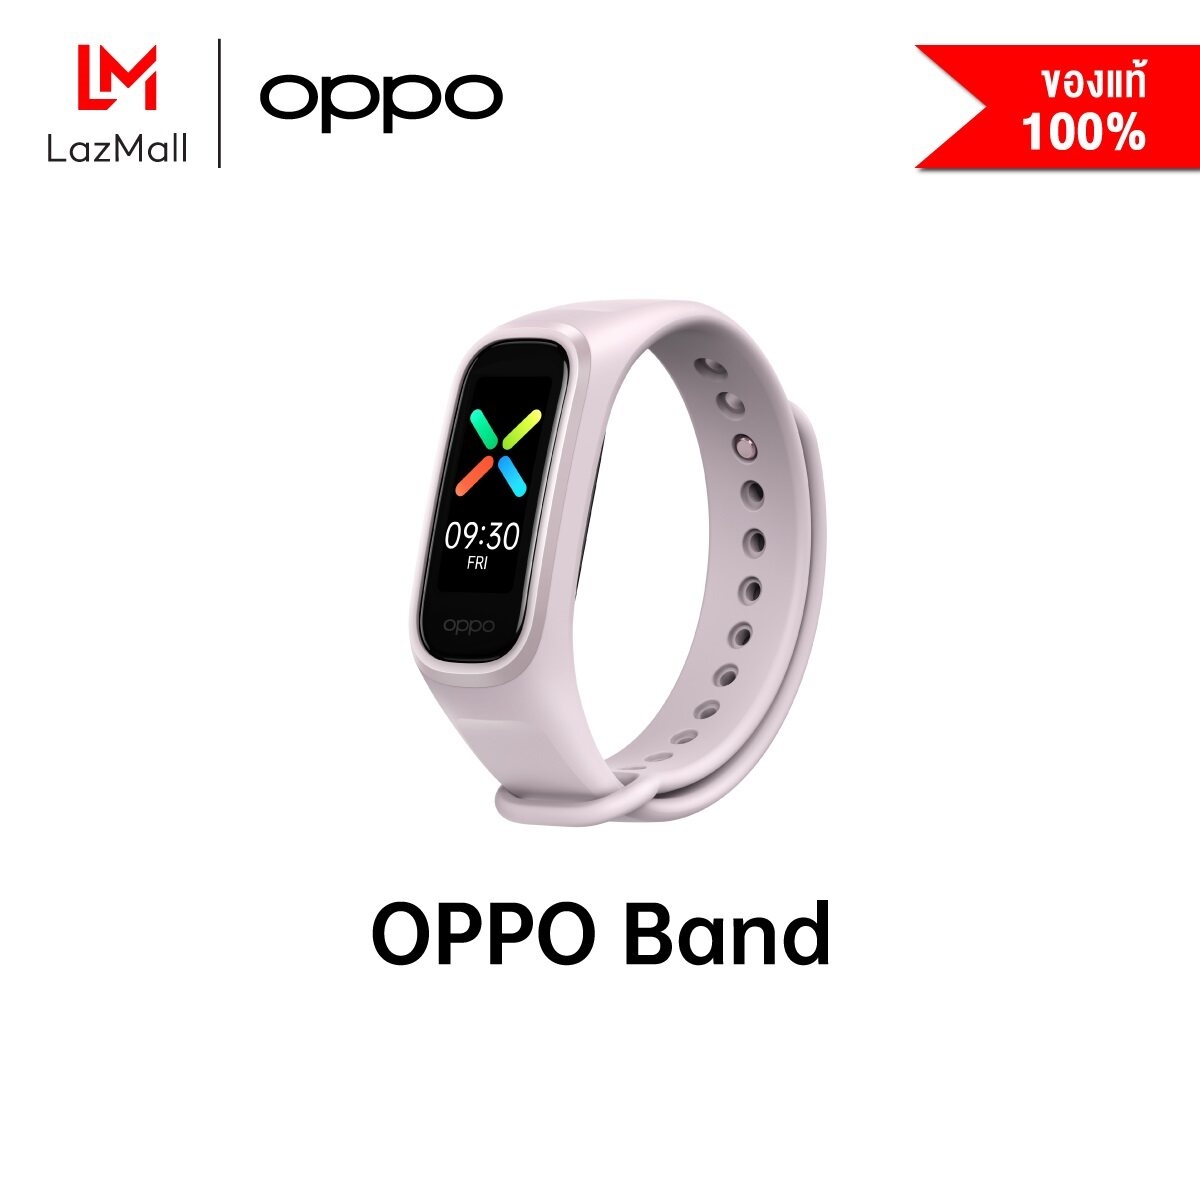 OPPO Band สายรัดข้อมืออัจฉริยะจอ AMOLED วัดออกซิเจนในเลือดได้วัดอัตราการเต้นของหัวใจได้กันน้ำลึกกว่า 50 เมตรรับฟรี! สายนาฬิกาเพิ่มอีก 1 เส้น